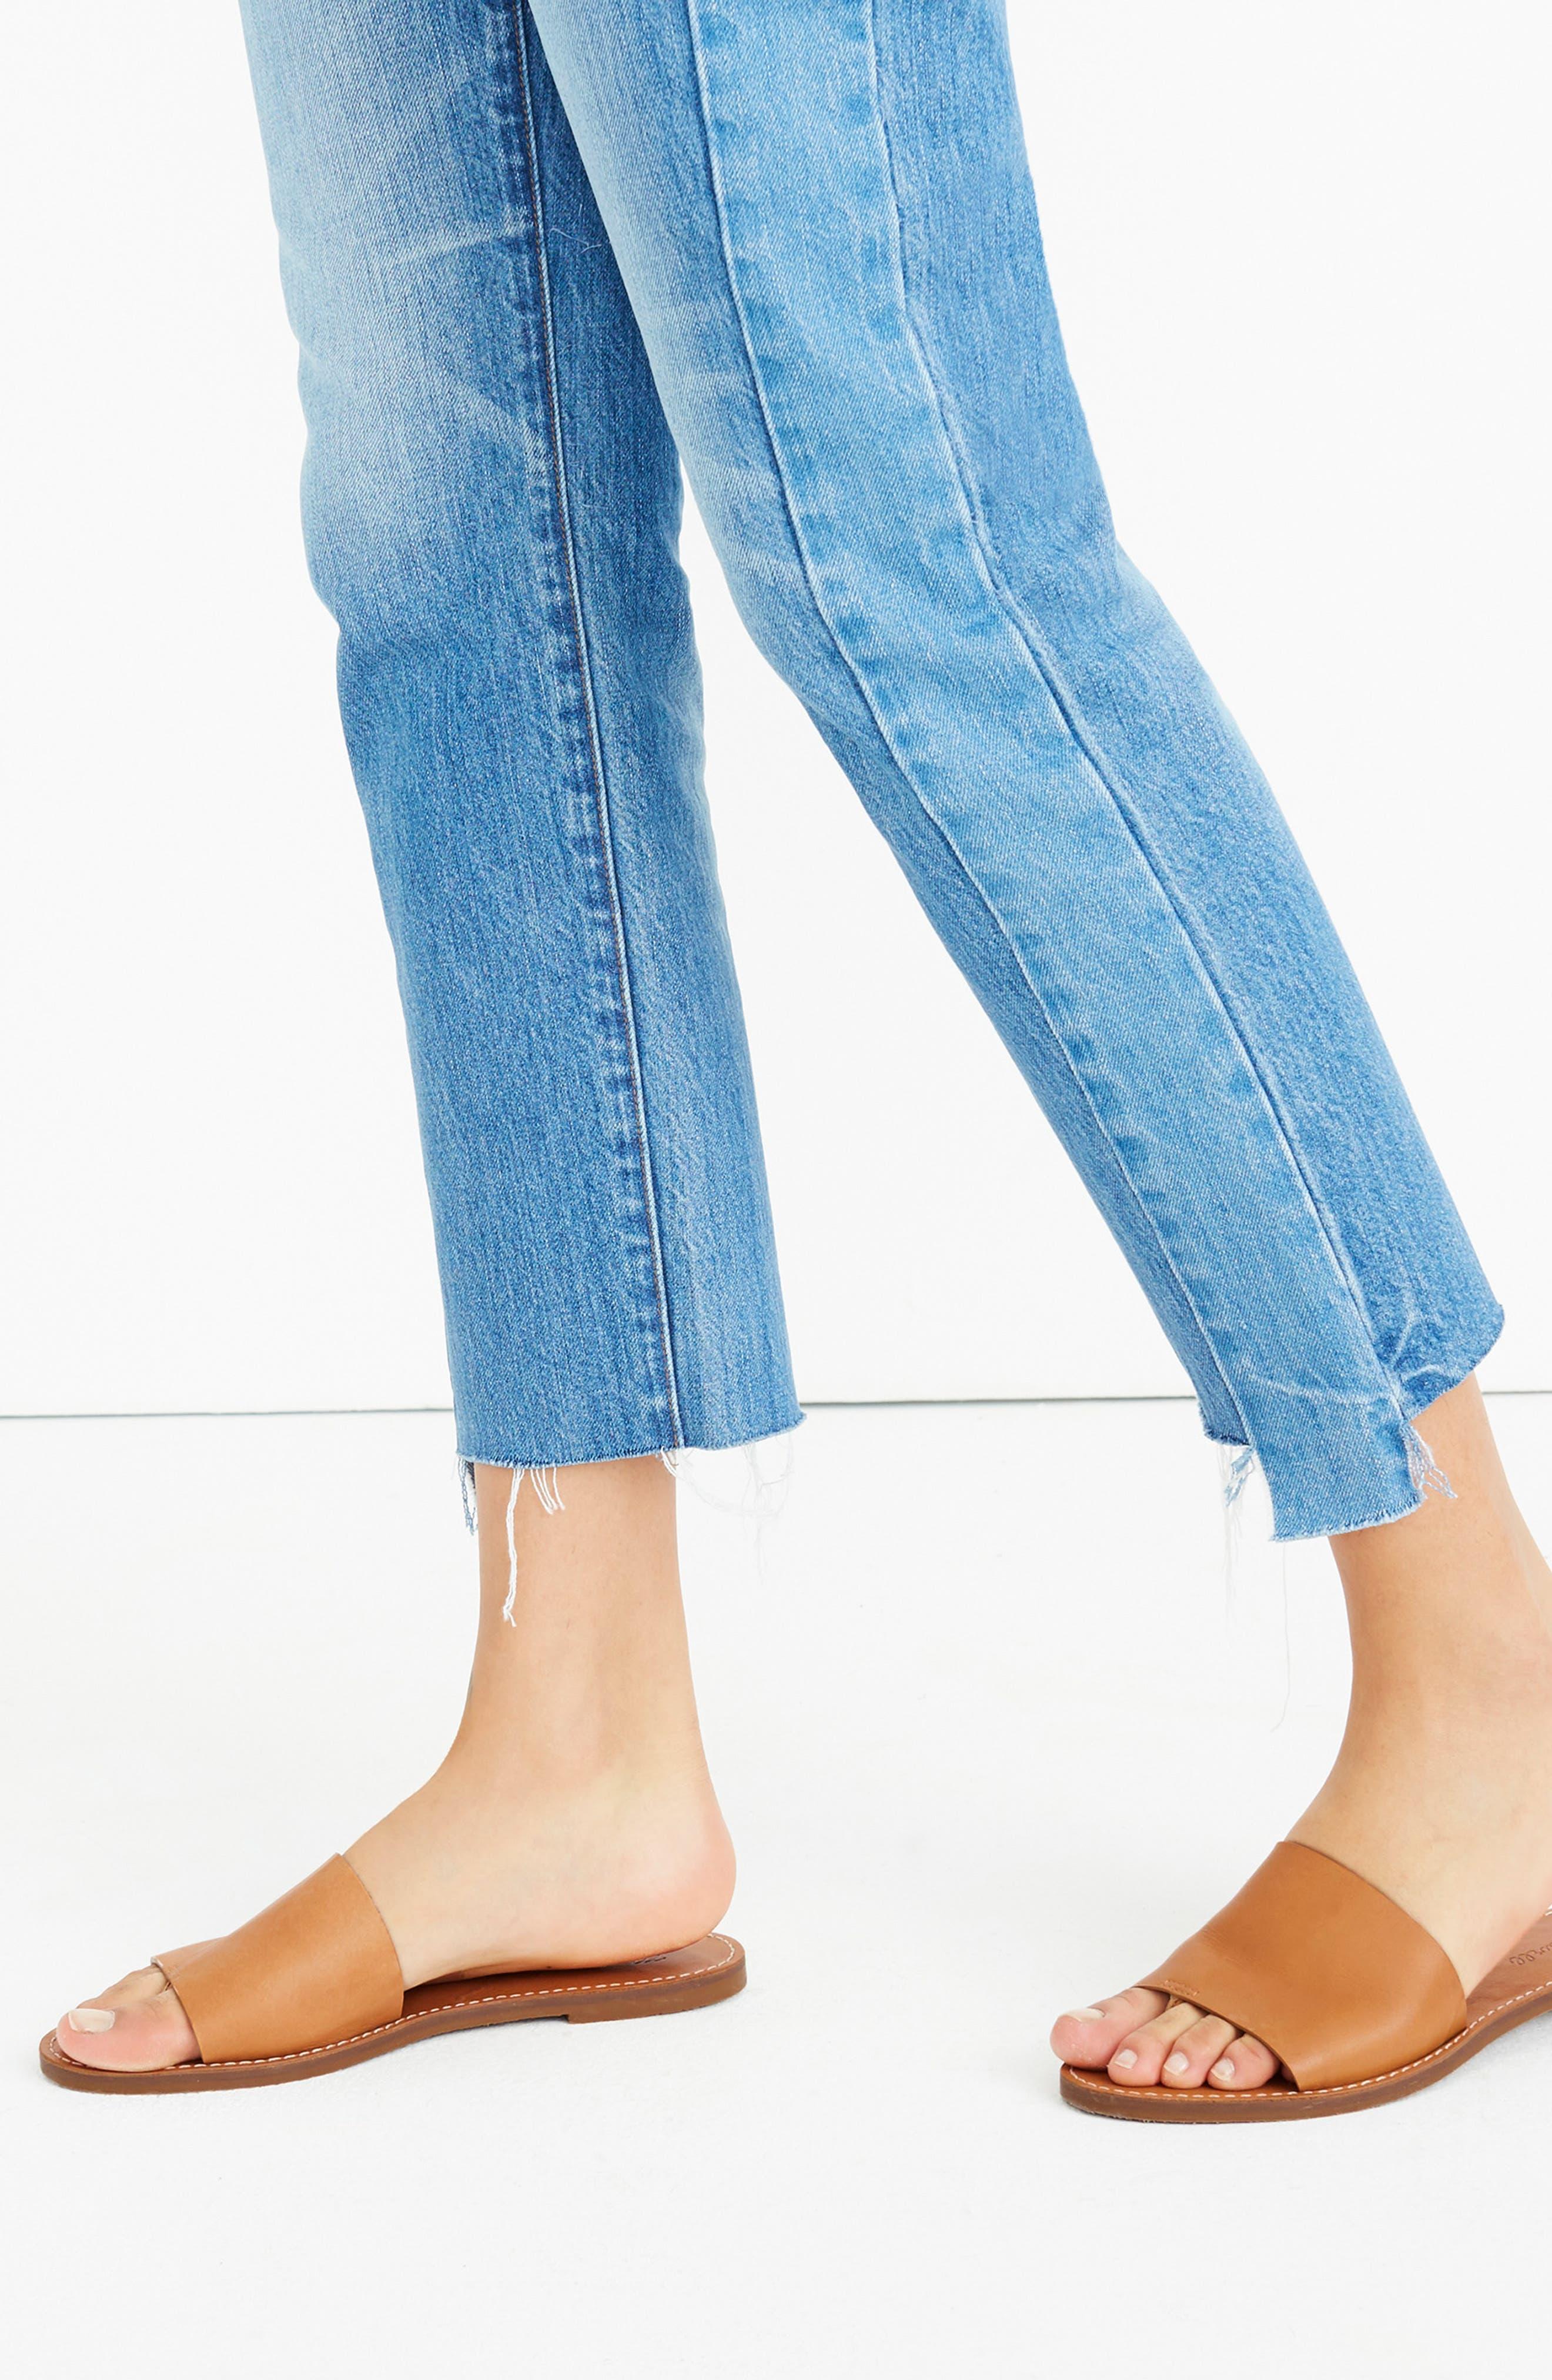 ea03e9745f19 Women s Madewell Sandals